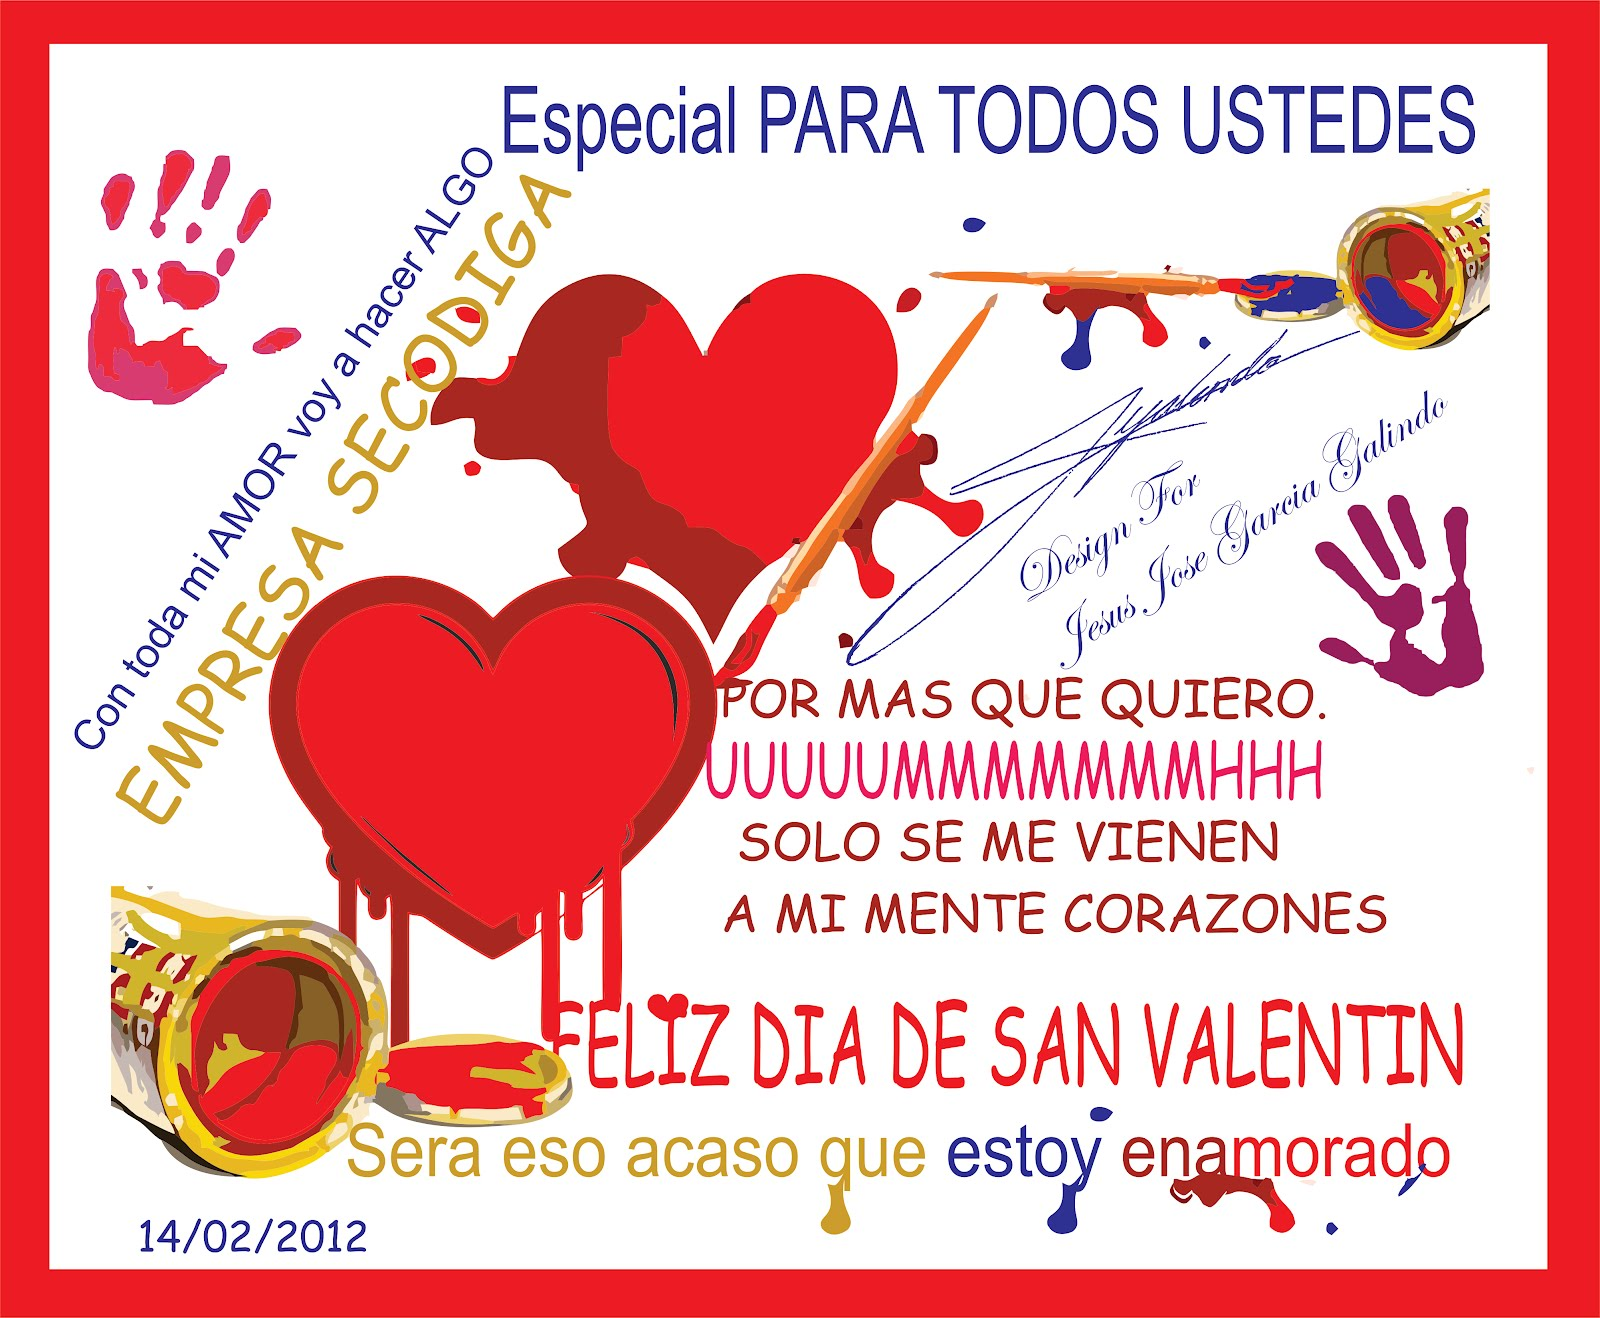 Feliz san valentin para solteros mulher por whatsapp Goiânia-24013